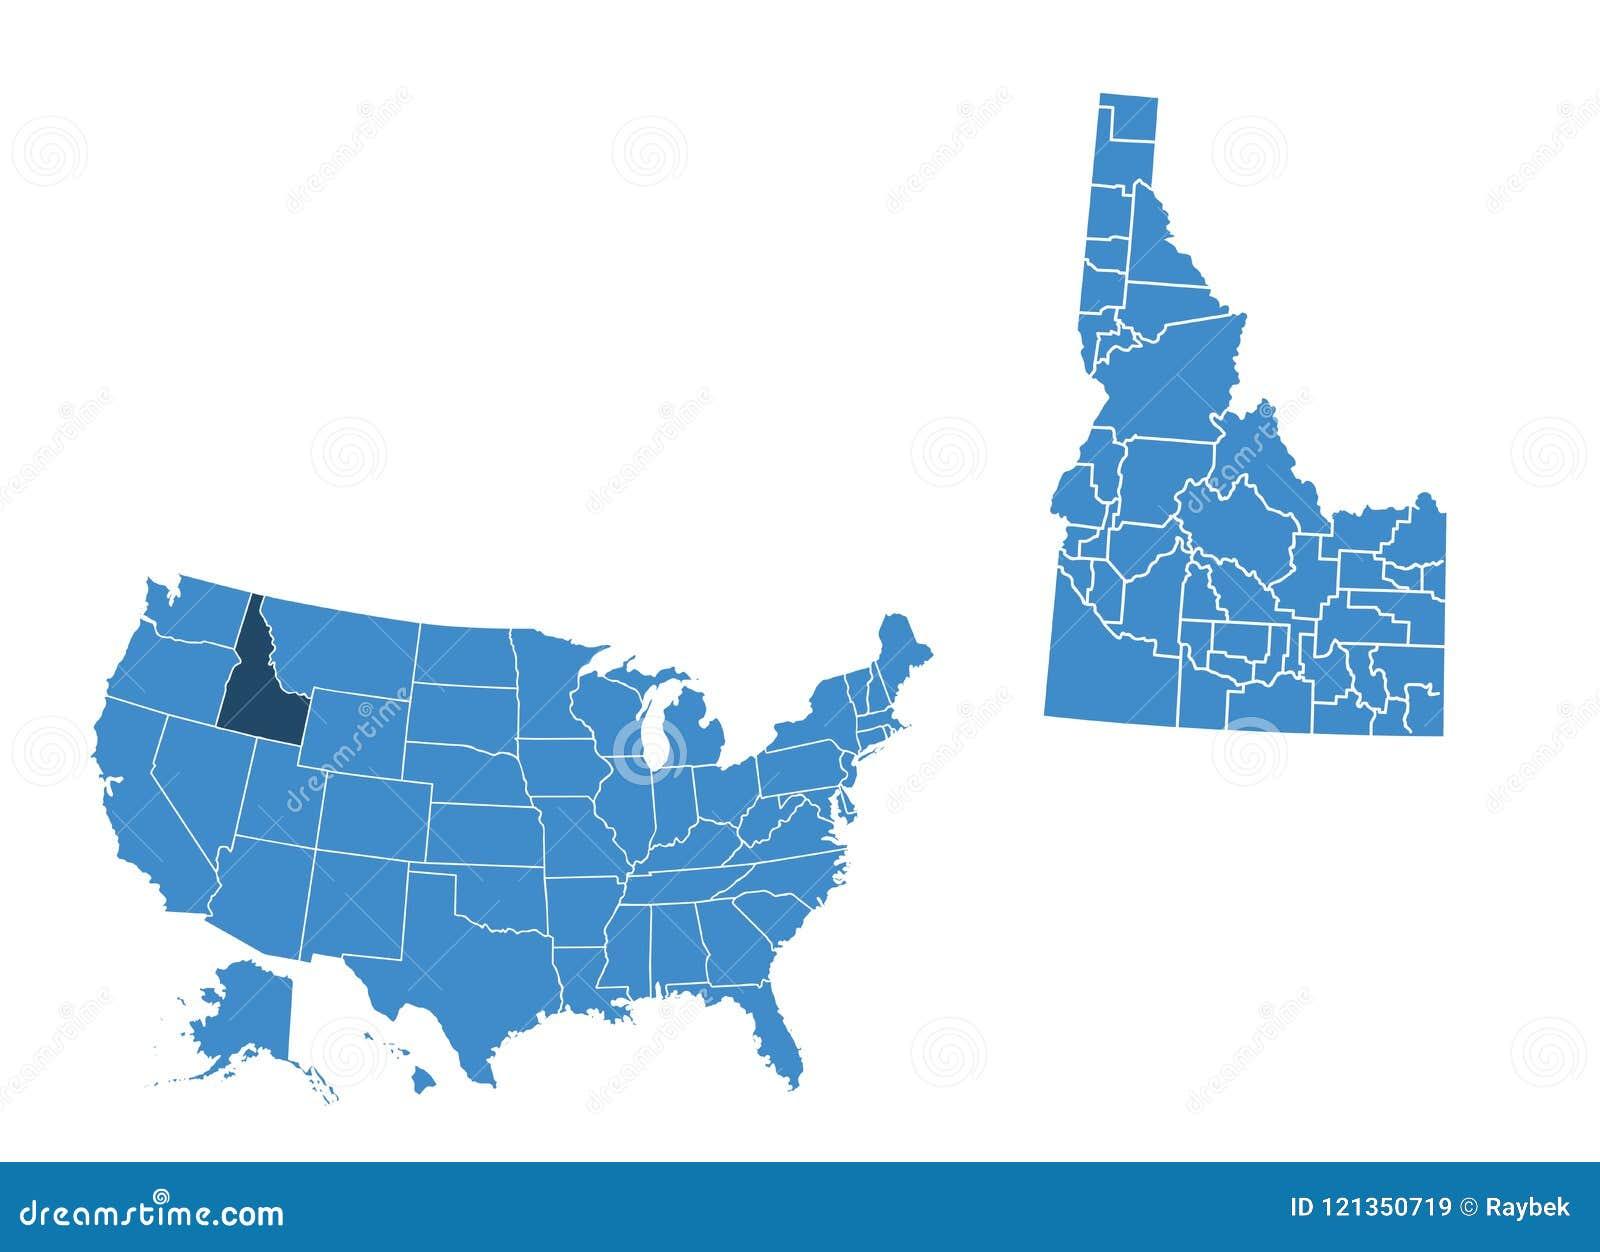 Map of Idaho state